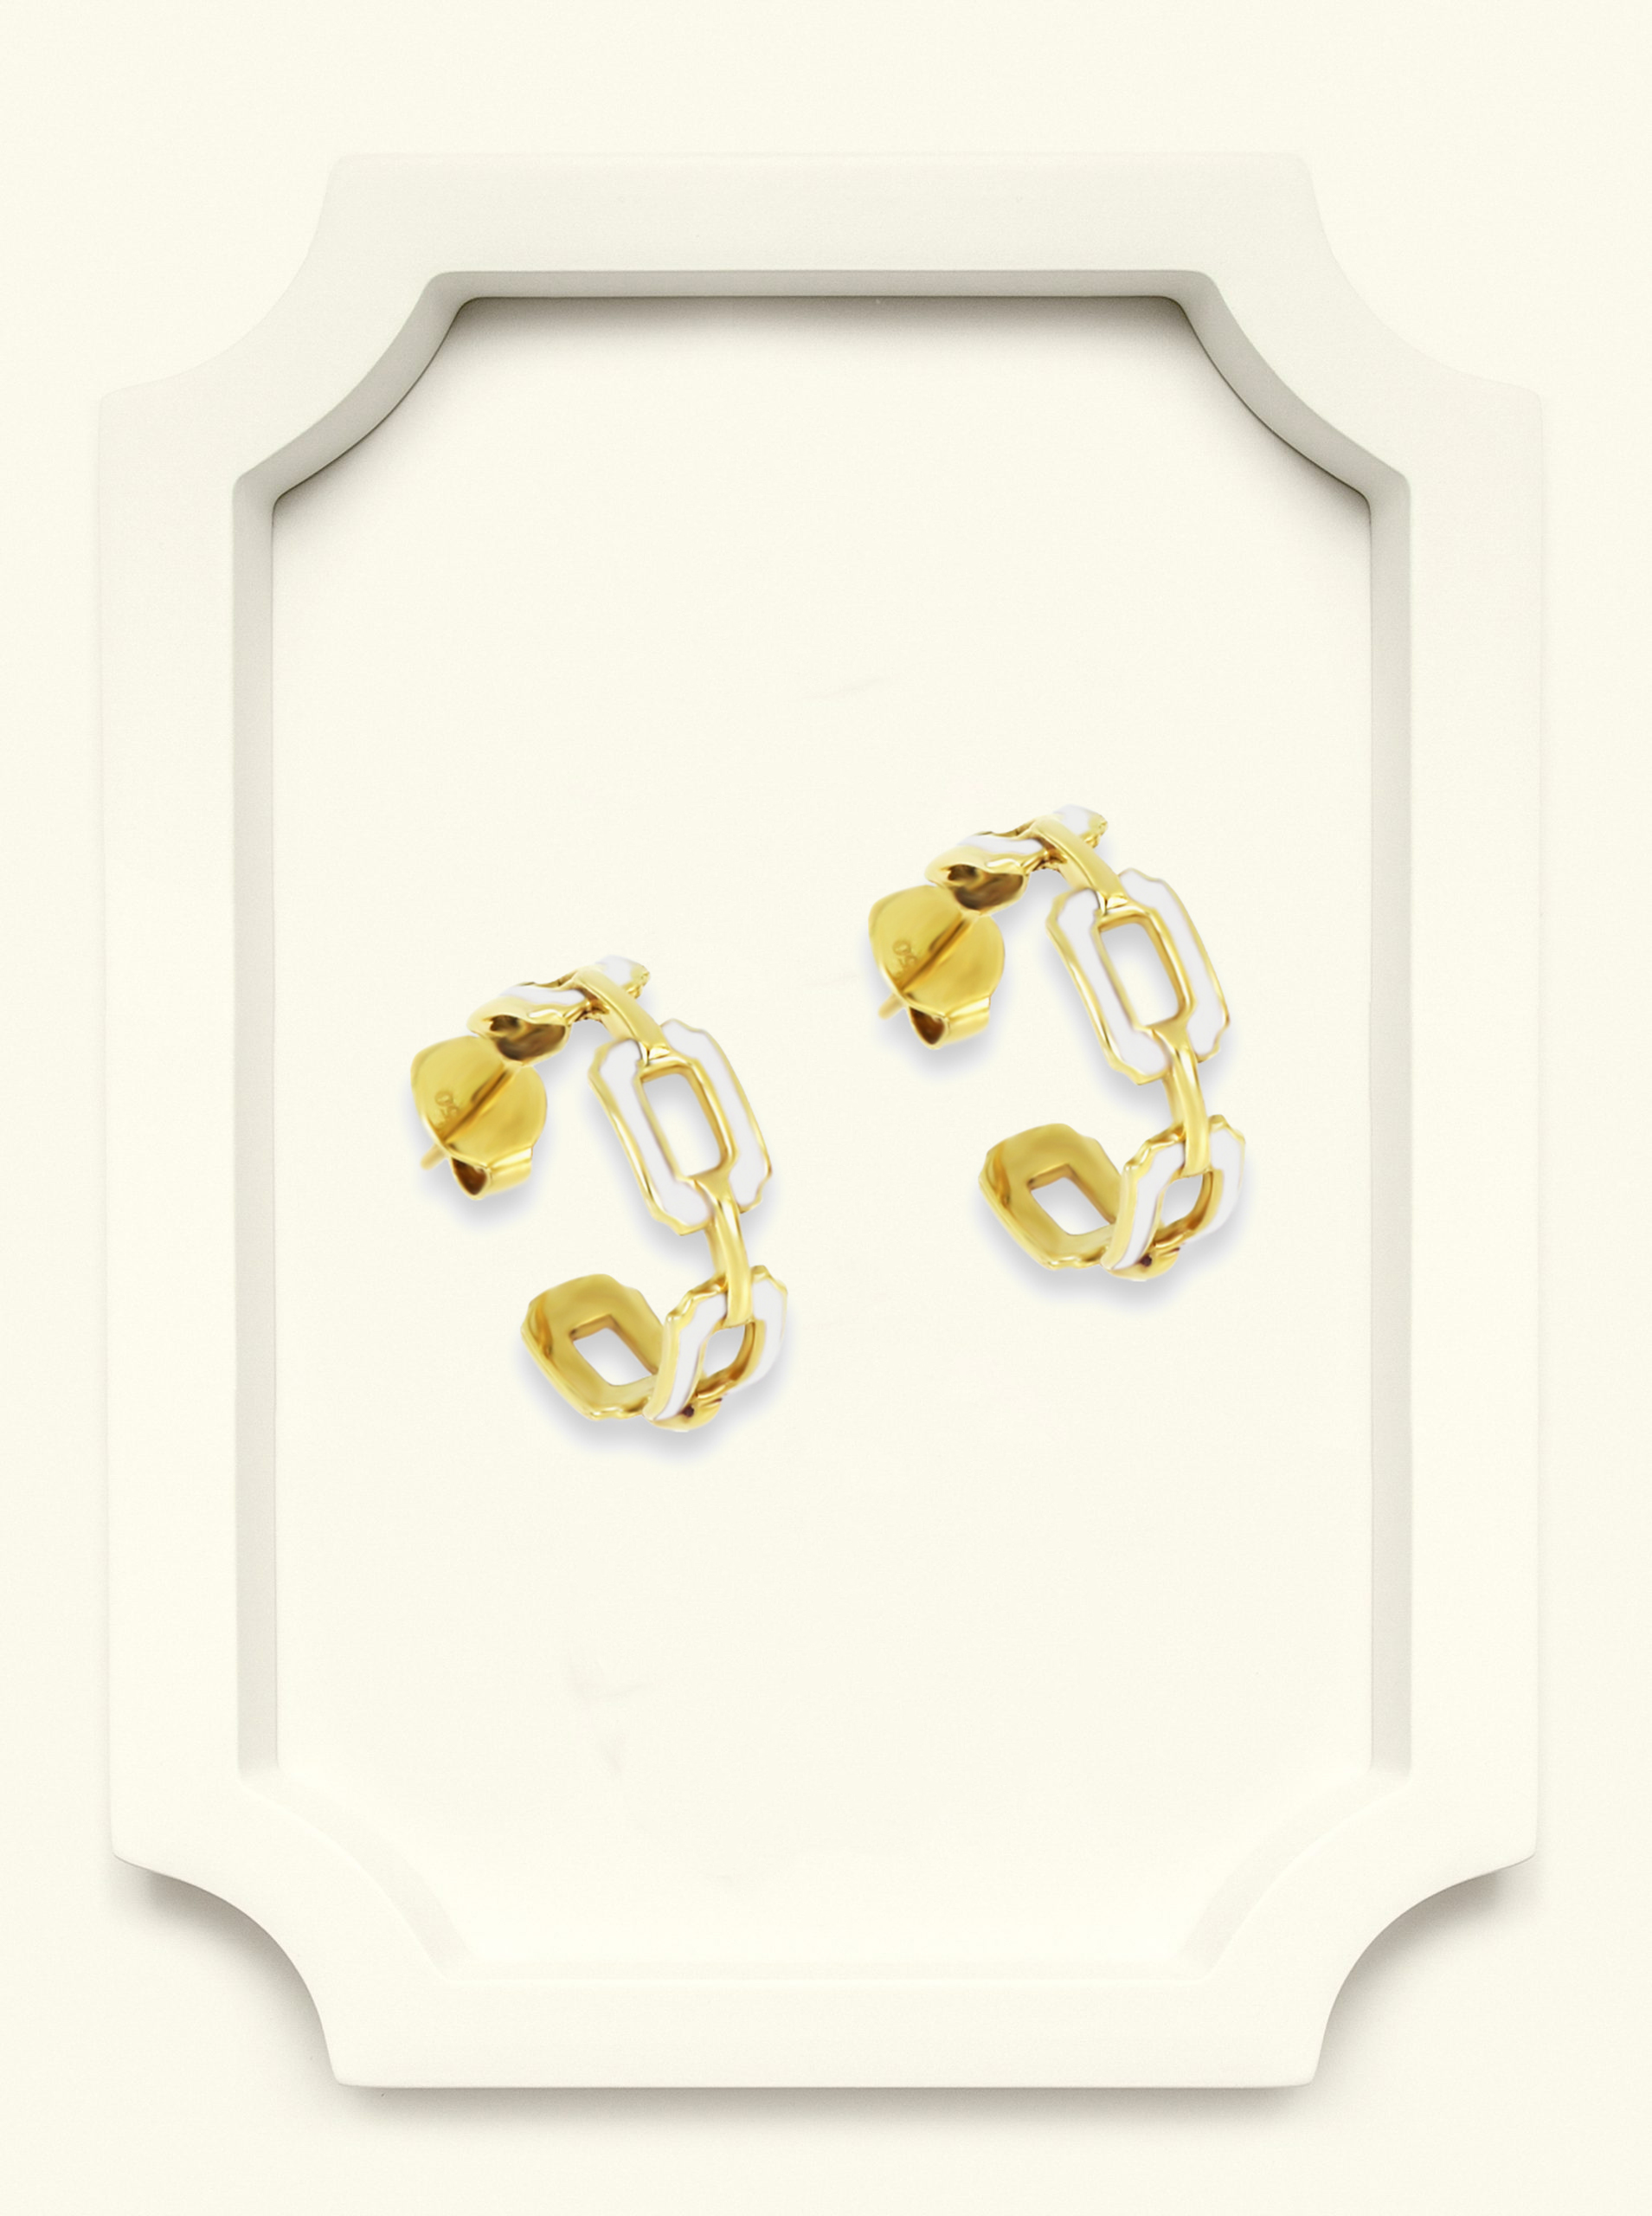 Saba Yellow Gold Signature Ring With white Enamel